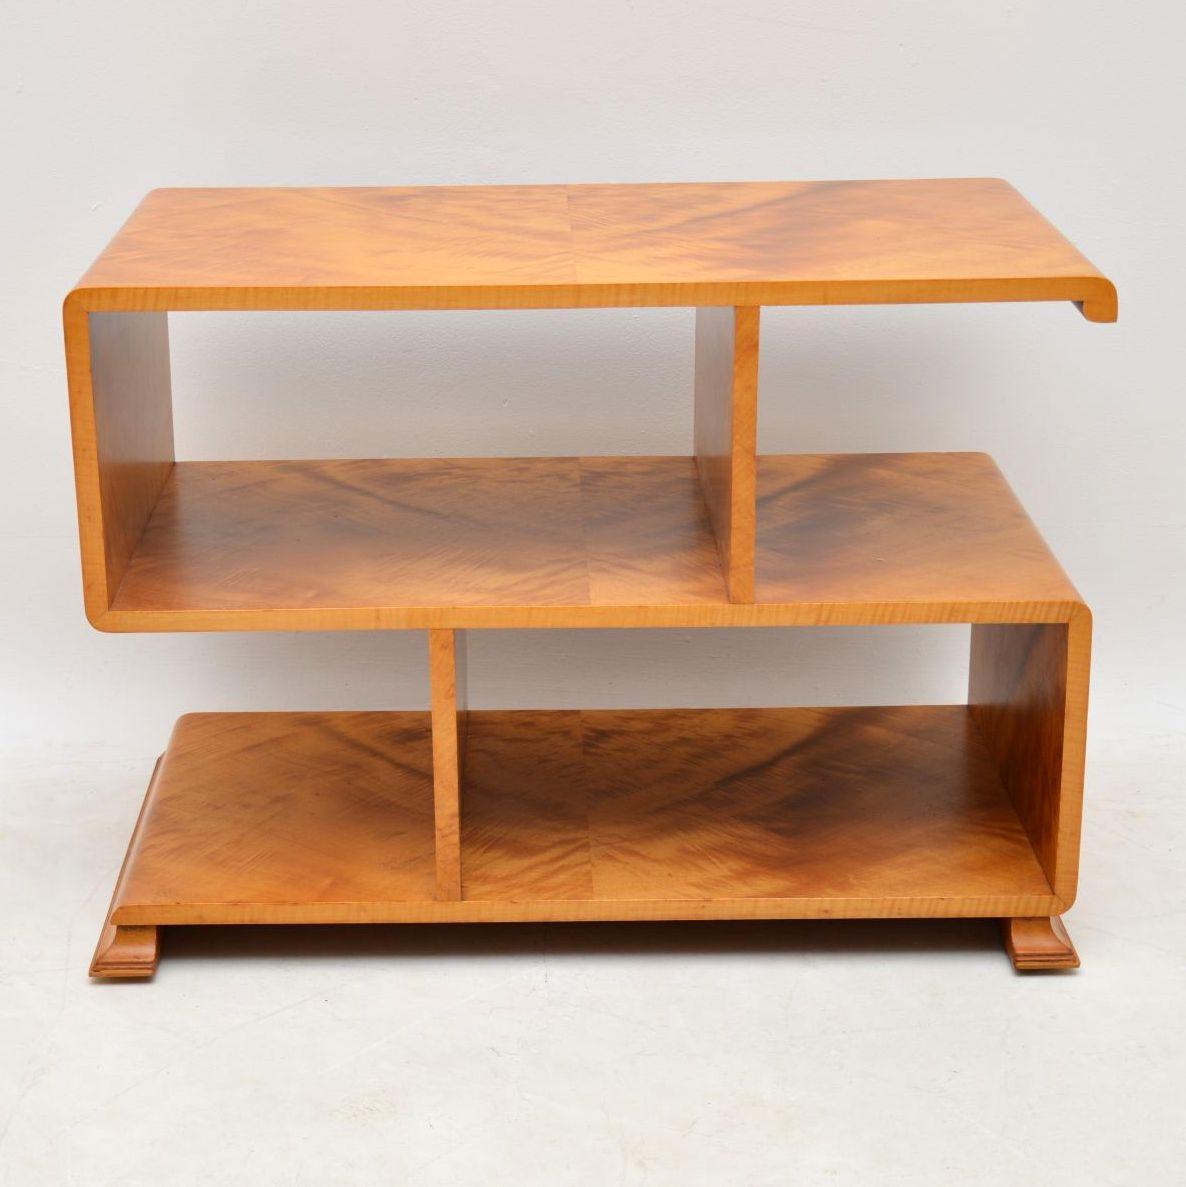 art_deco_antique_vintage_satin_wood_side_table_2